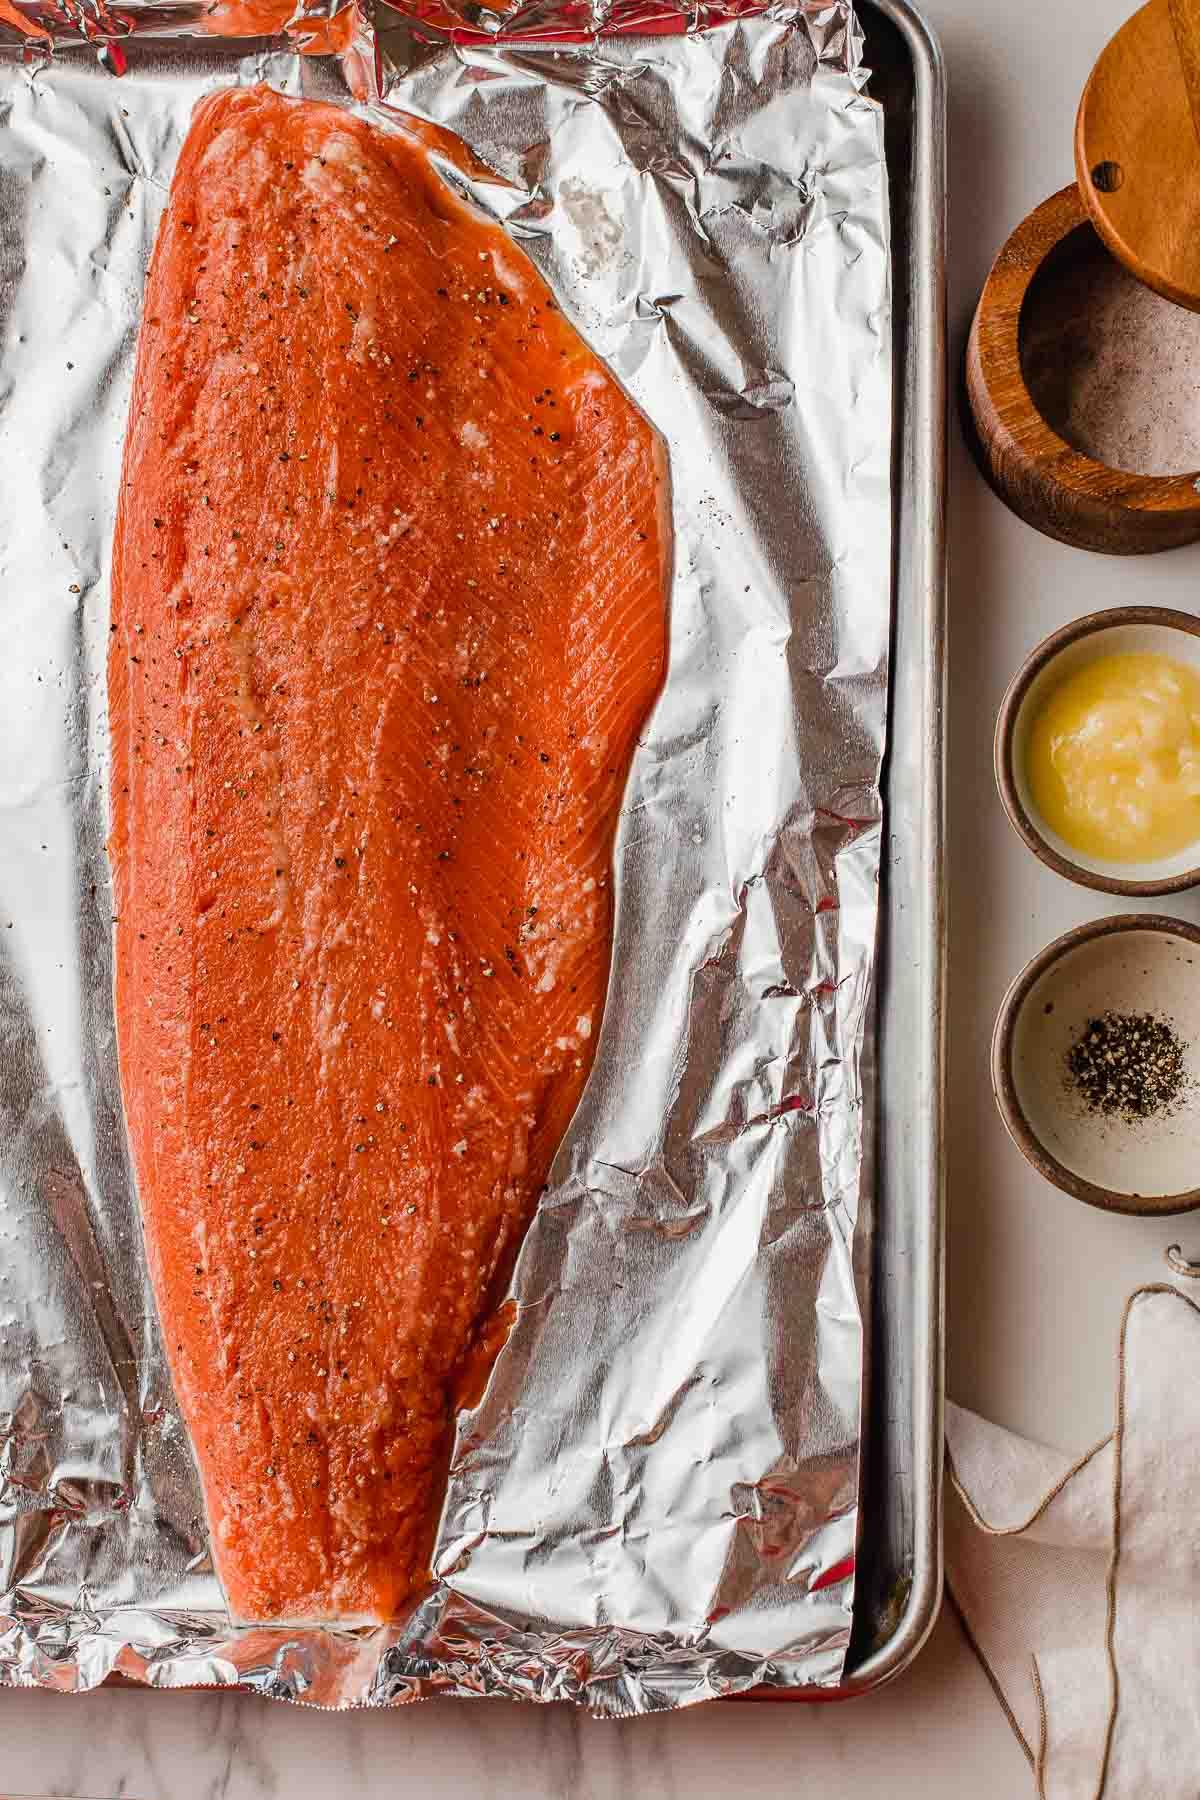 A salmon fillet on a baking sheet.